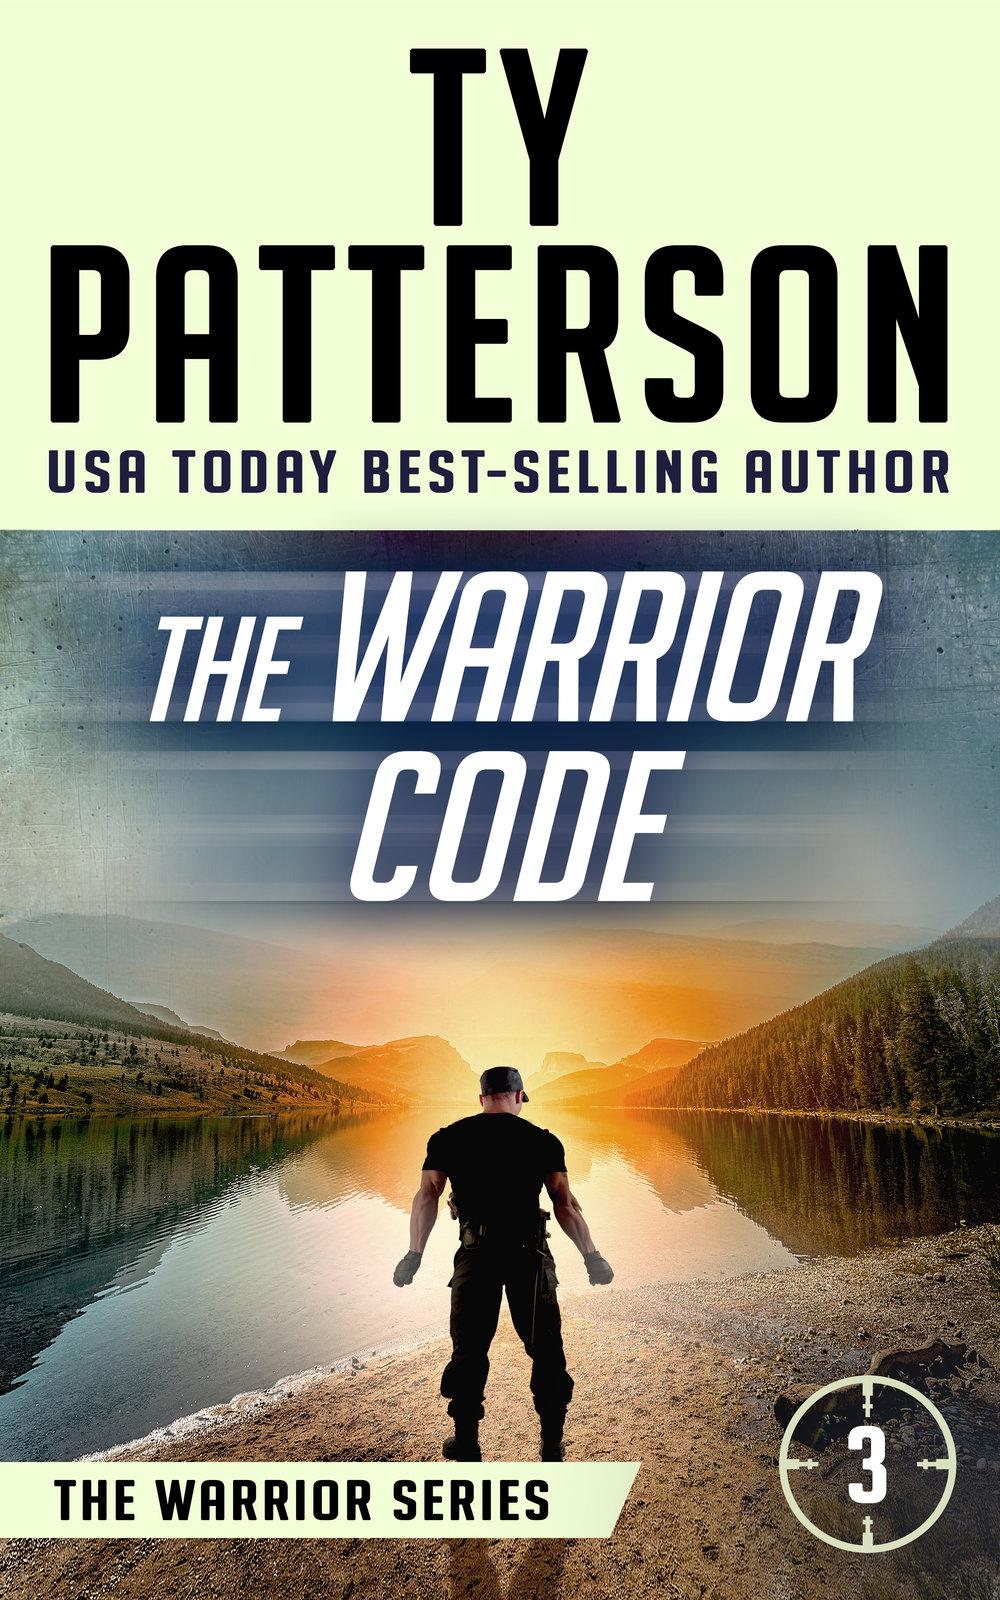 The+Warrior+Code+2018+2.jpg